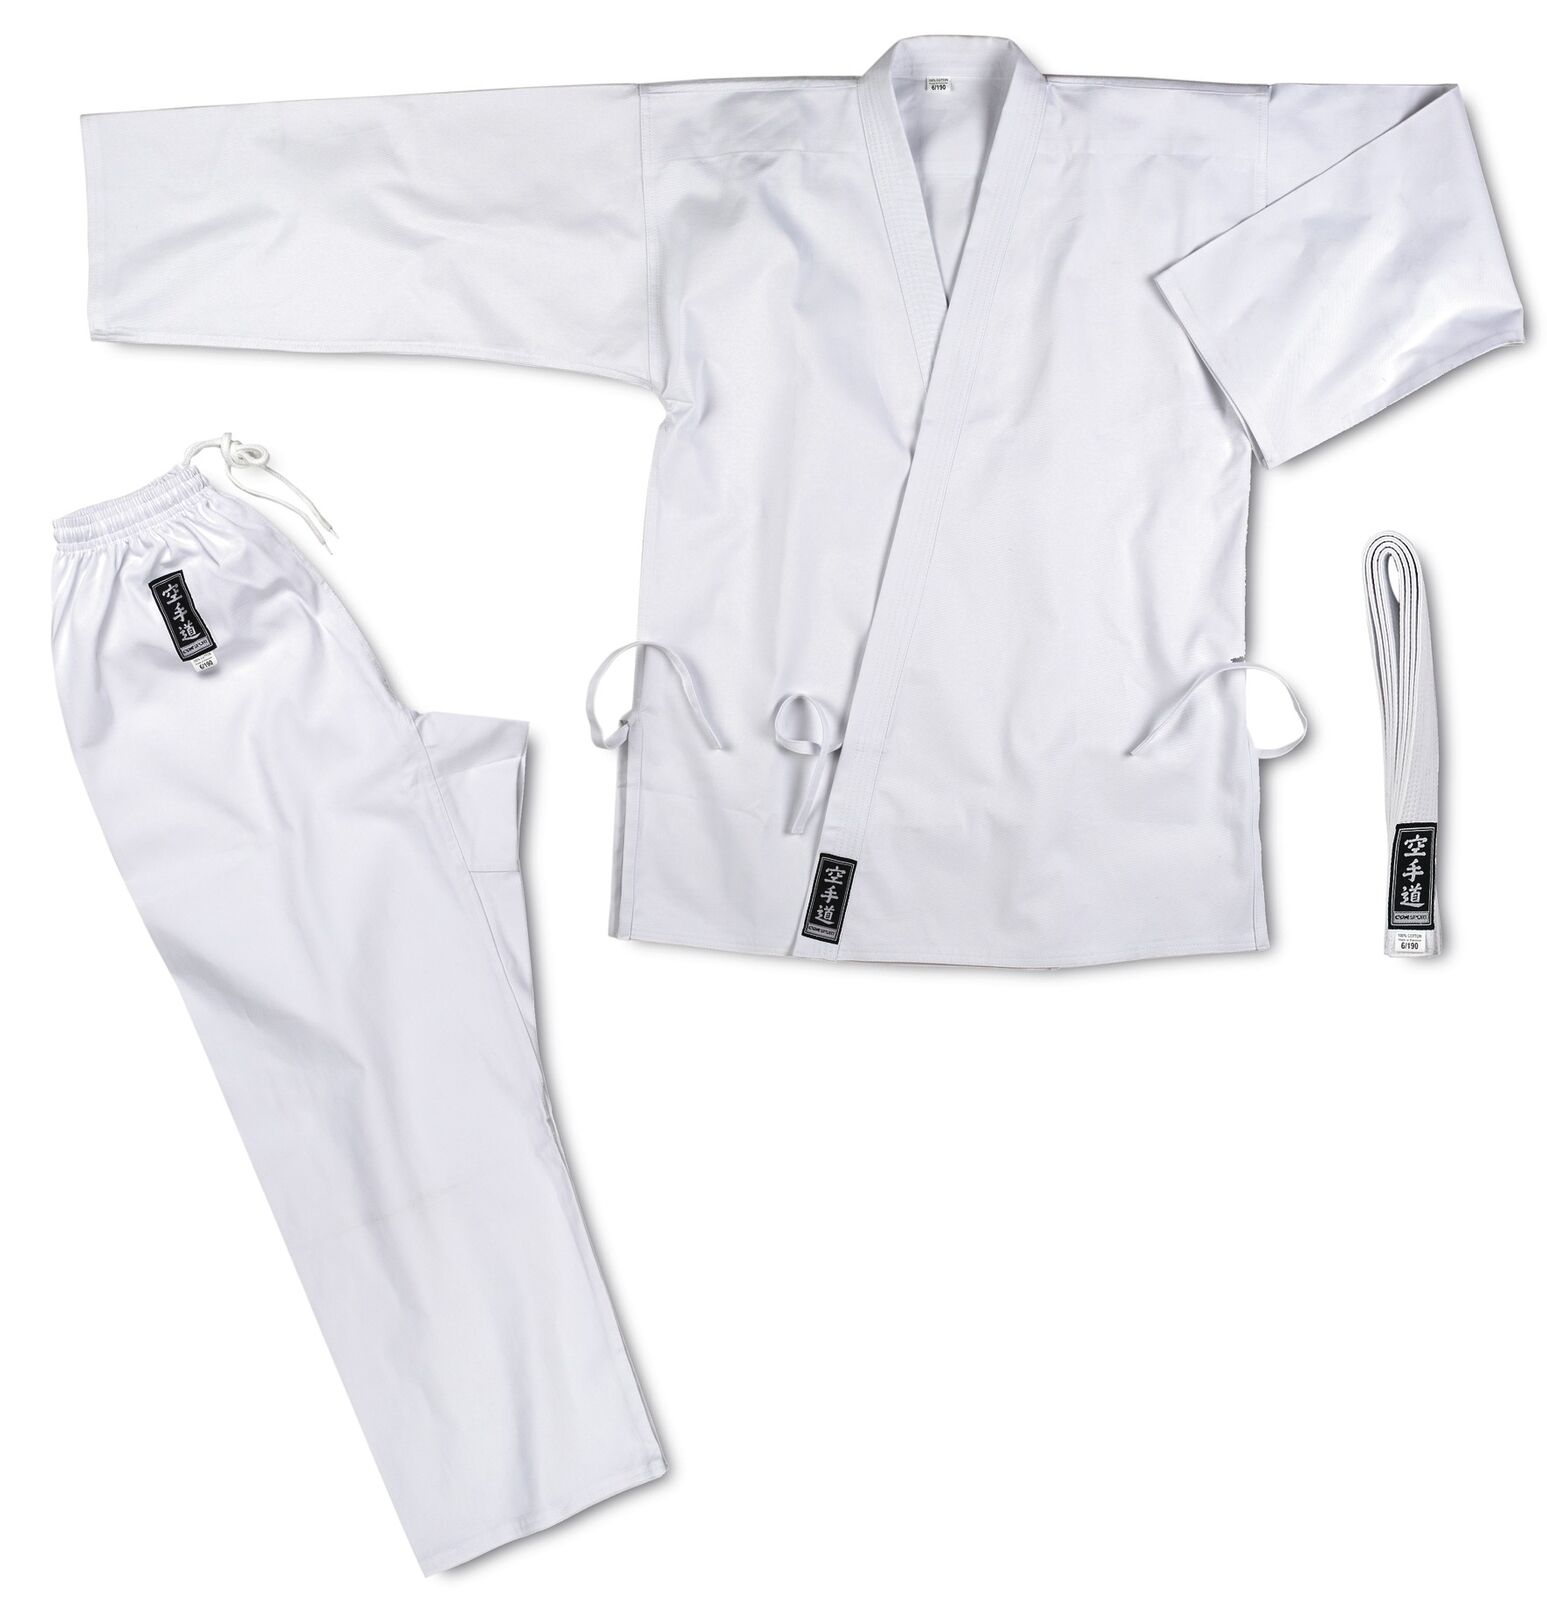 Karate-gi base cotone kimono kimono cotone bianco cintura CORSPORT divisa arti marziali scuola c36d17